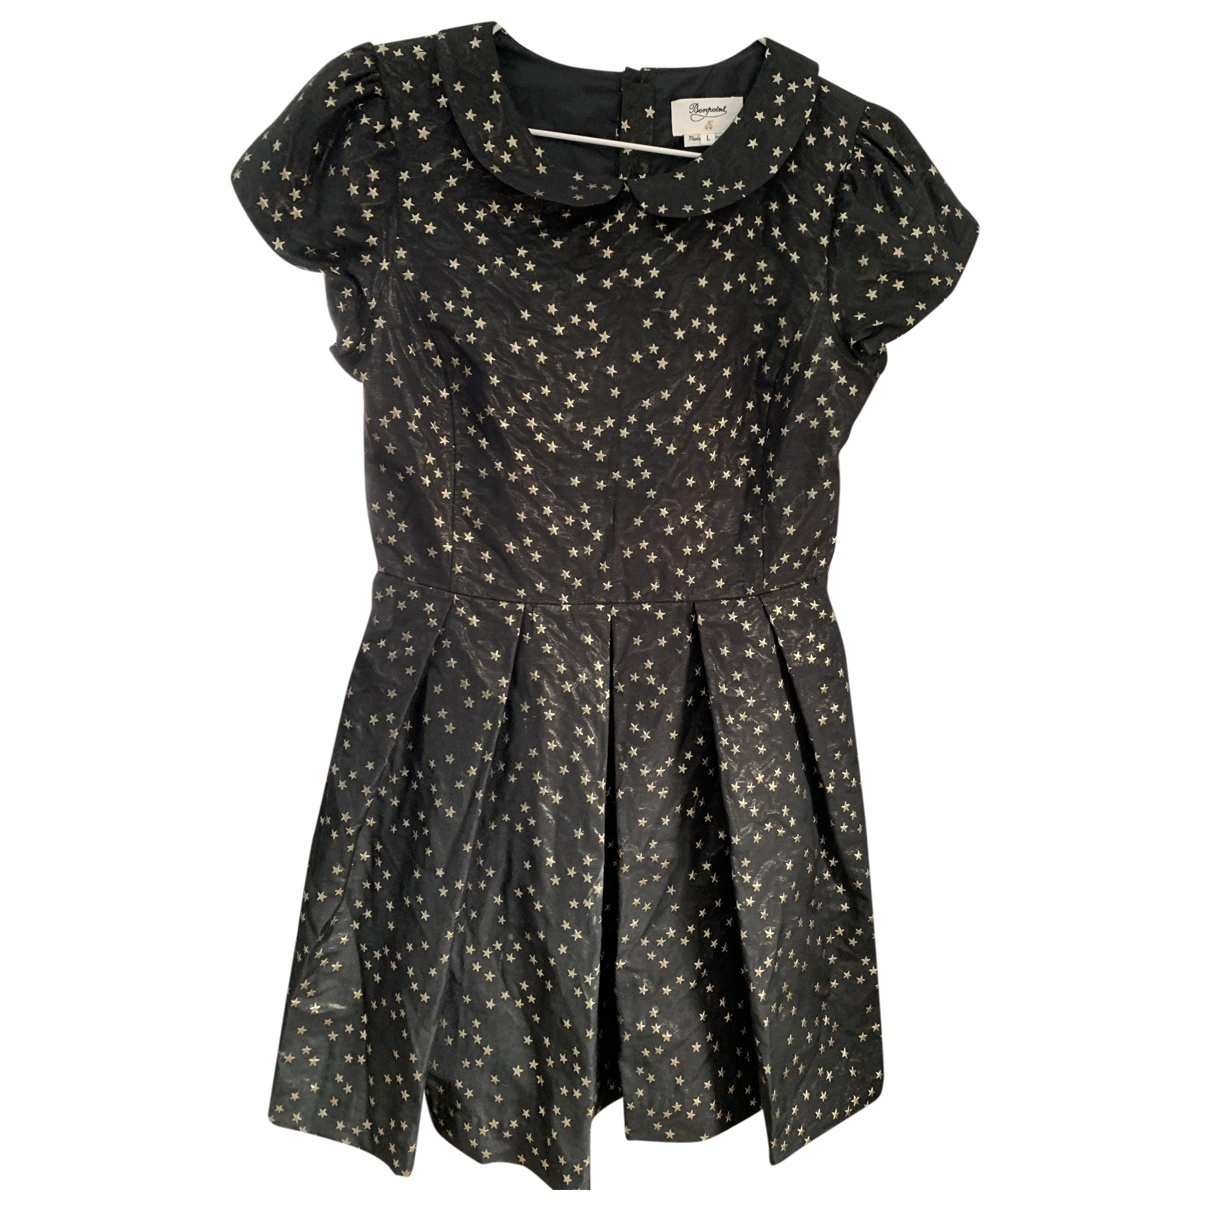 Bonpoint \N Black dress for Kids 18 years - L FR